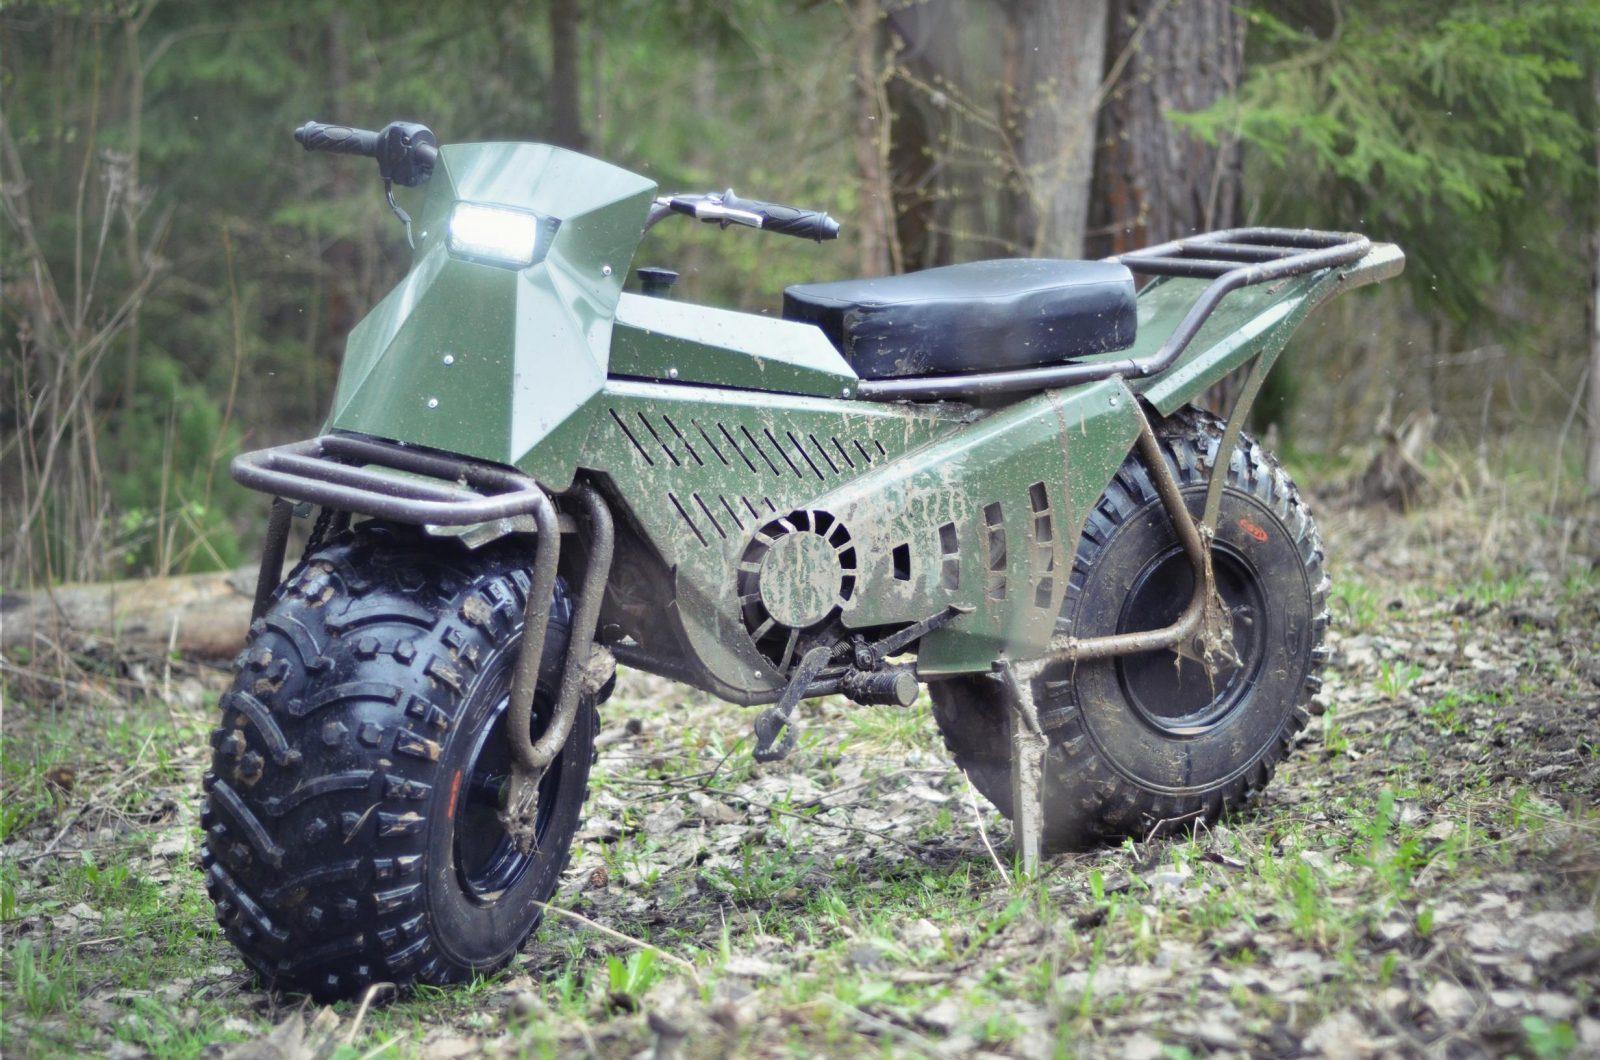 Taurus 2x2 Adventure Motorcycle Silodrome